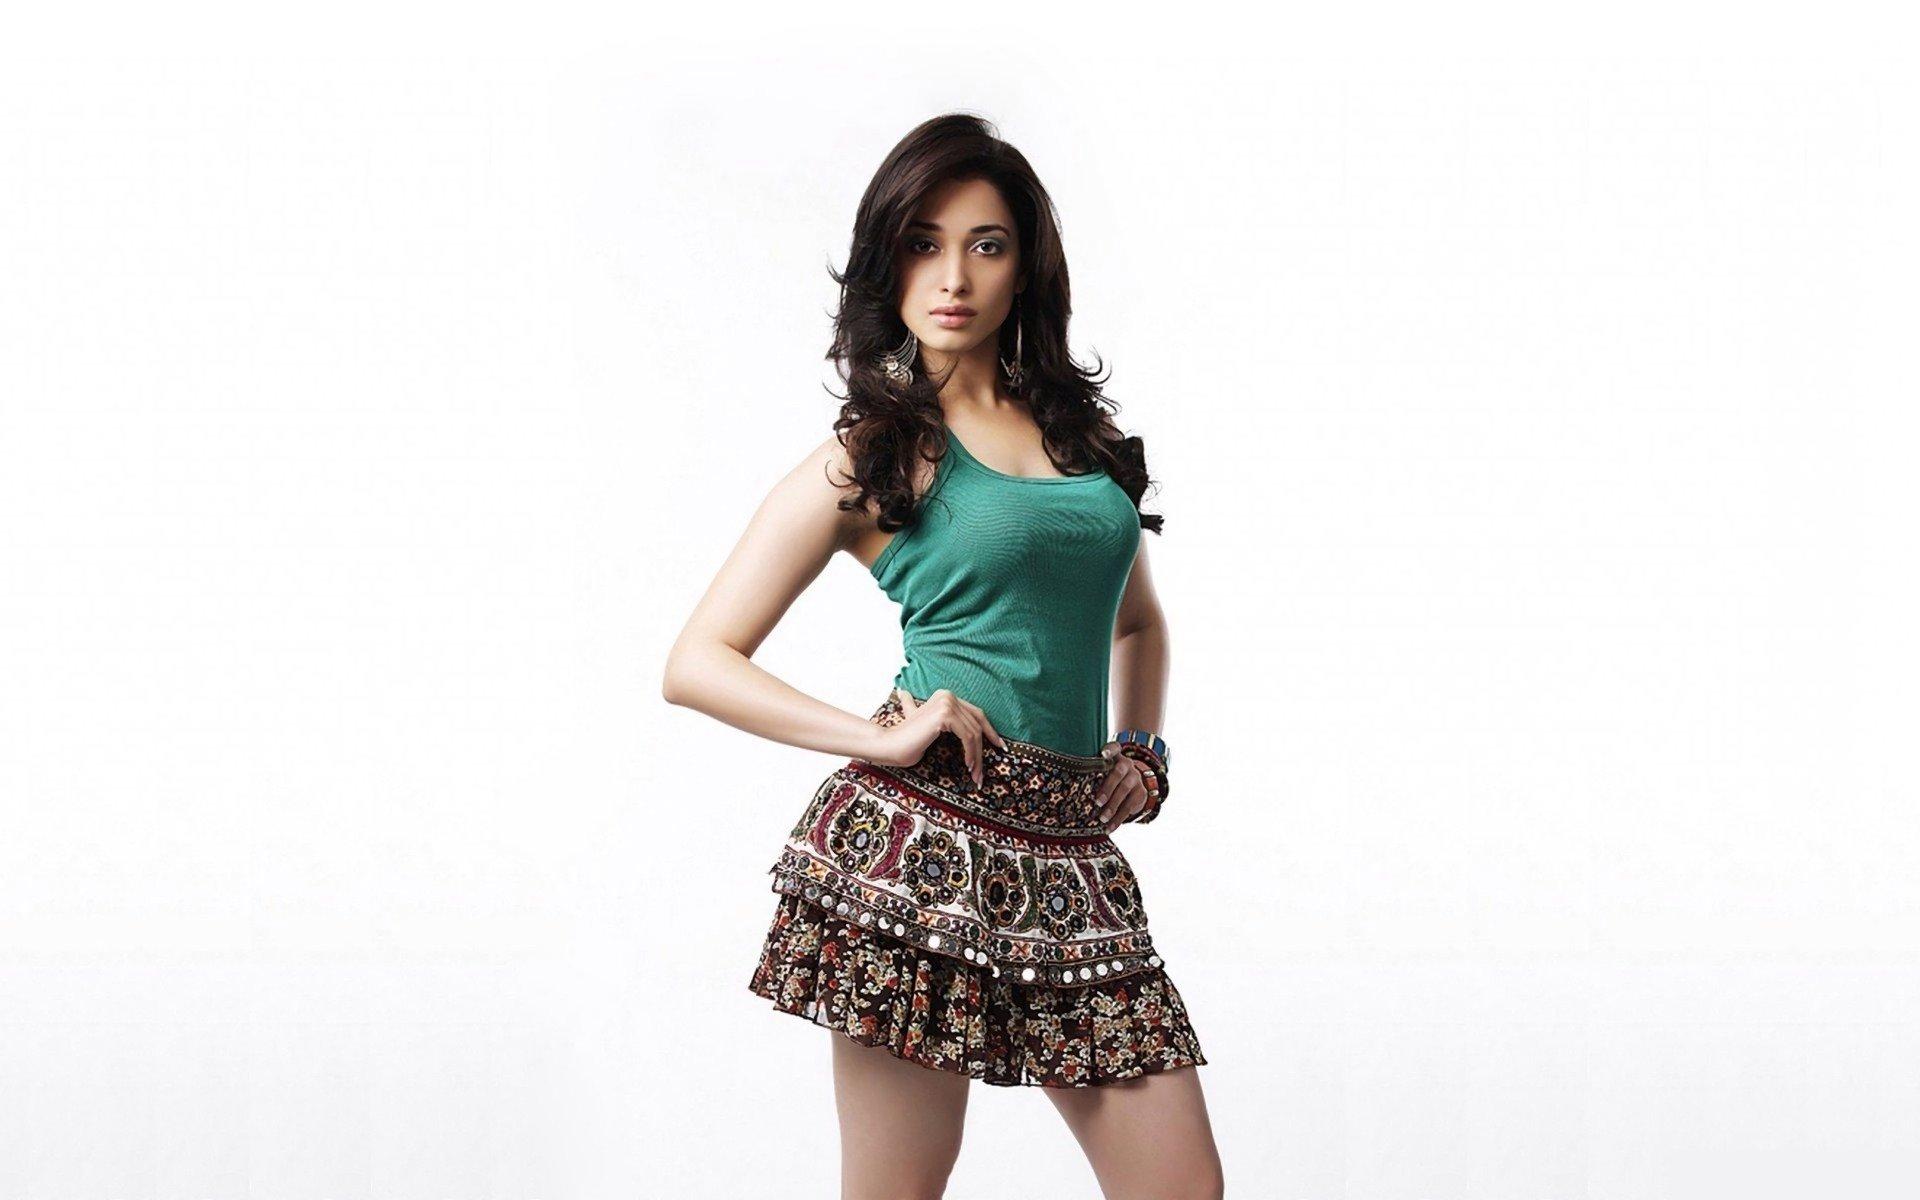 Download Hd Tamannaah Bhatia Desktop Wallpaper Id - Hot Indian Girl Png , HD Wallpaper & Backgrounds